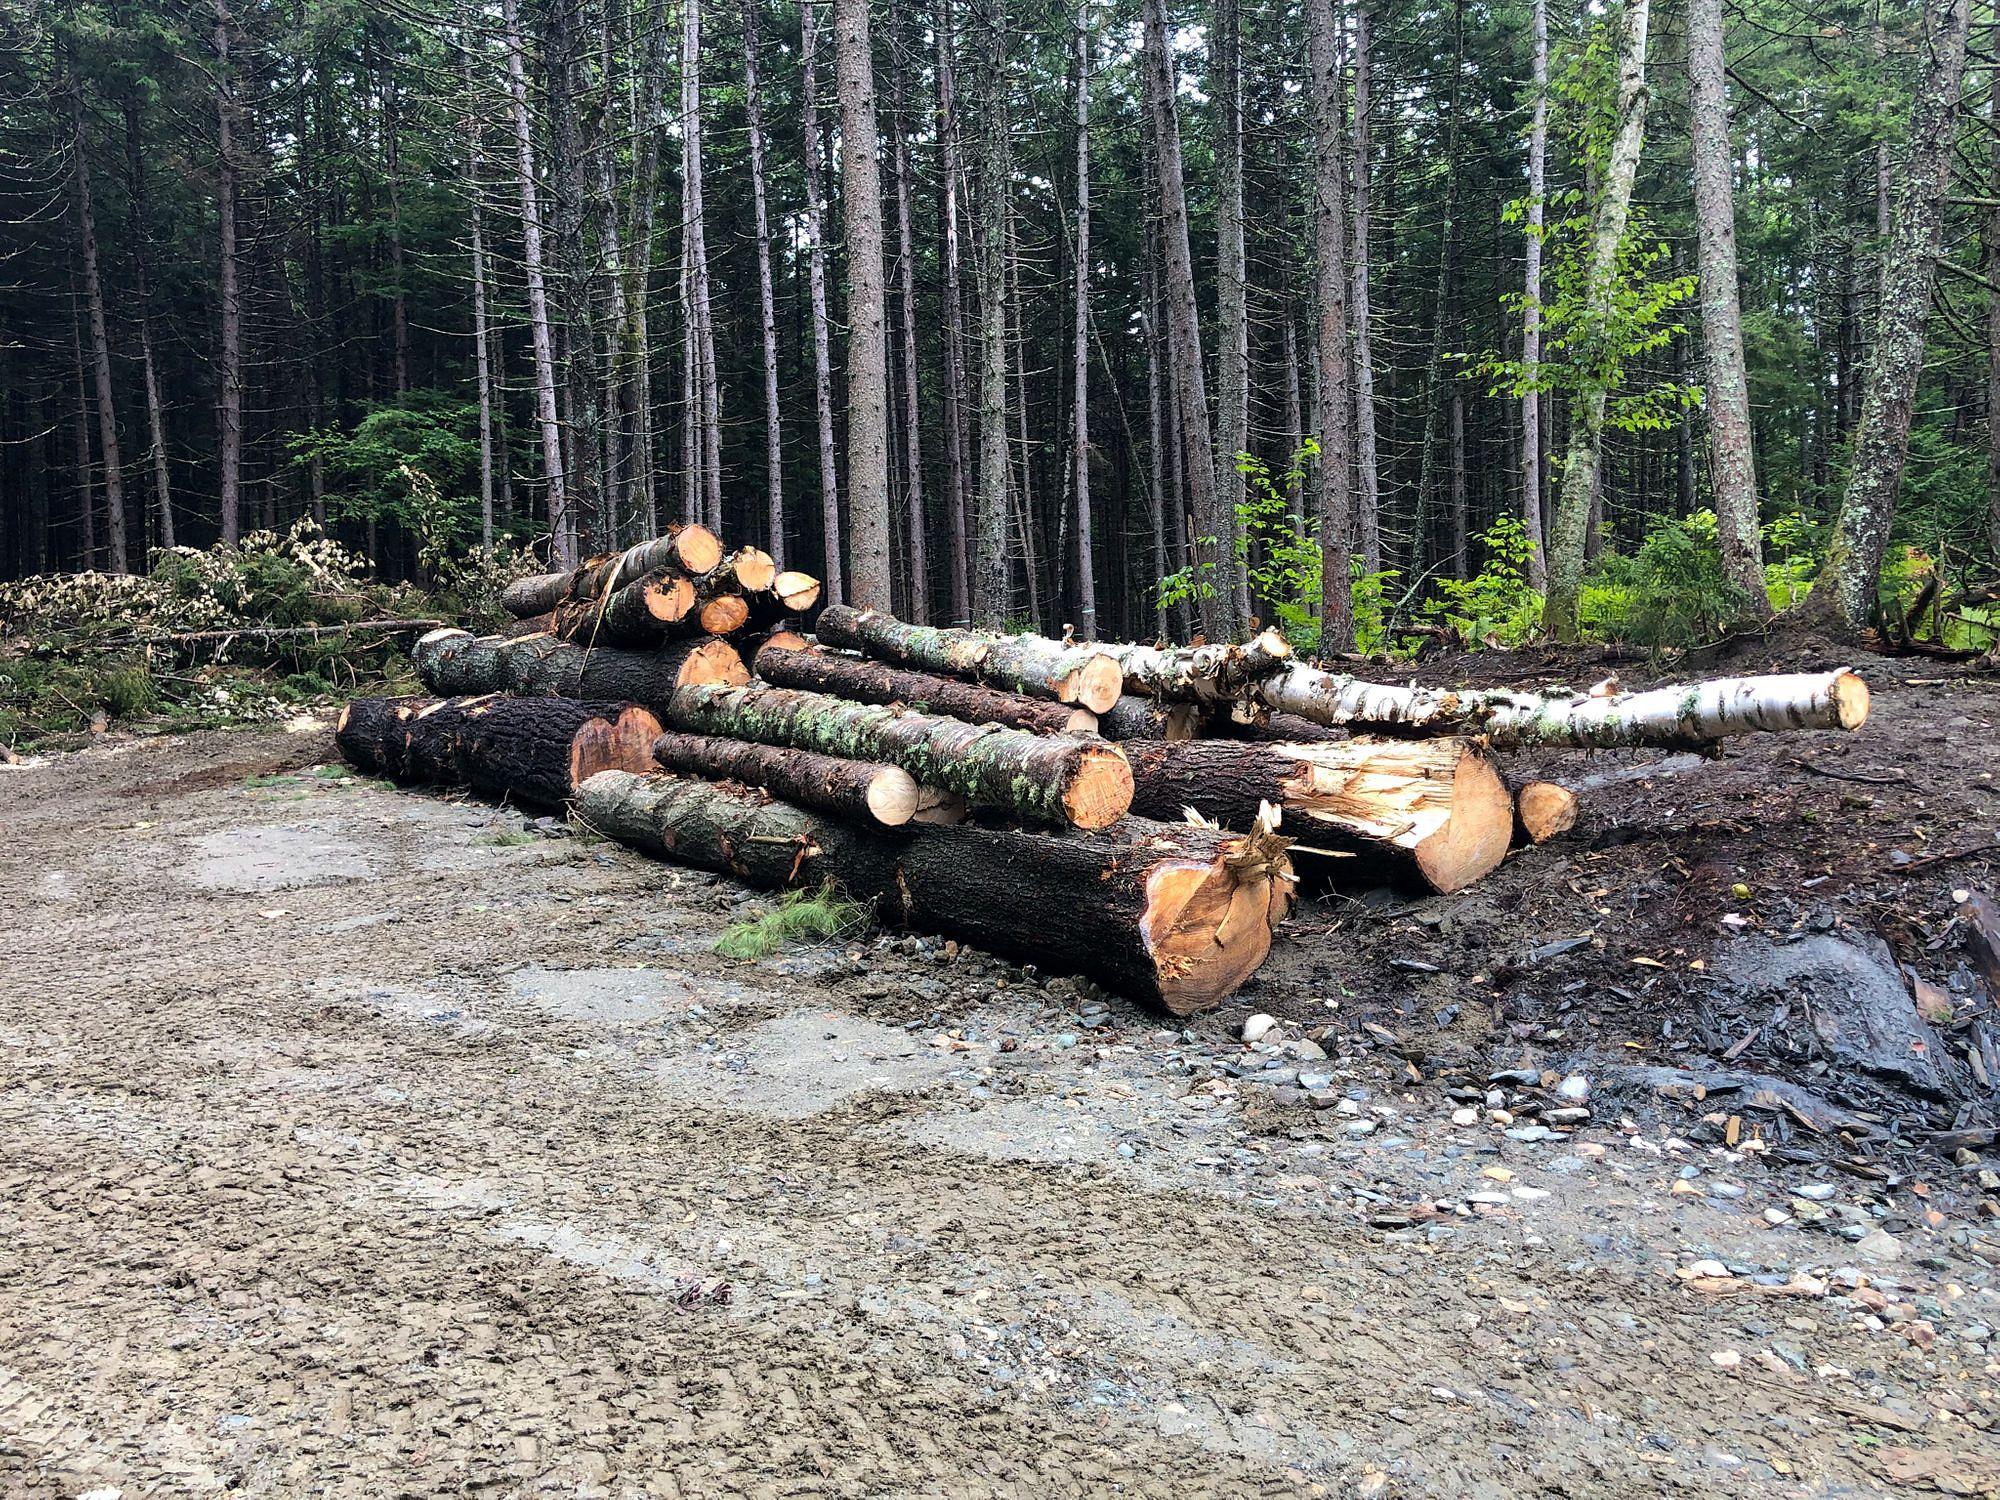 Logs for Milling